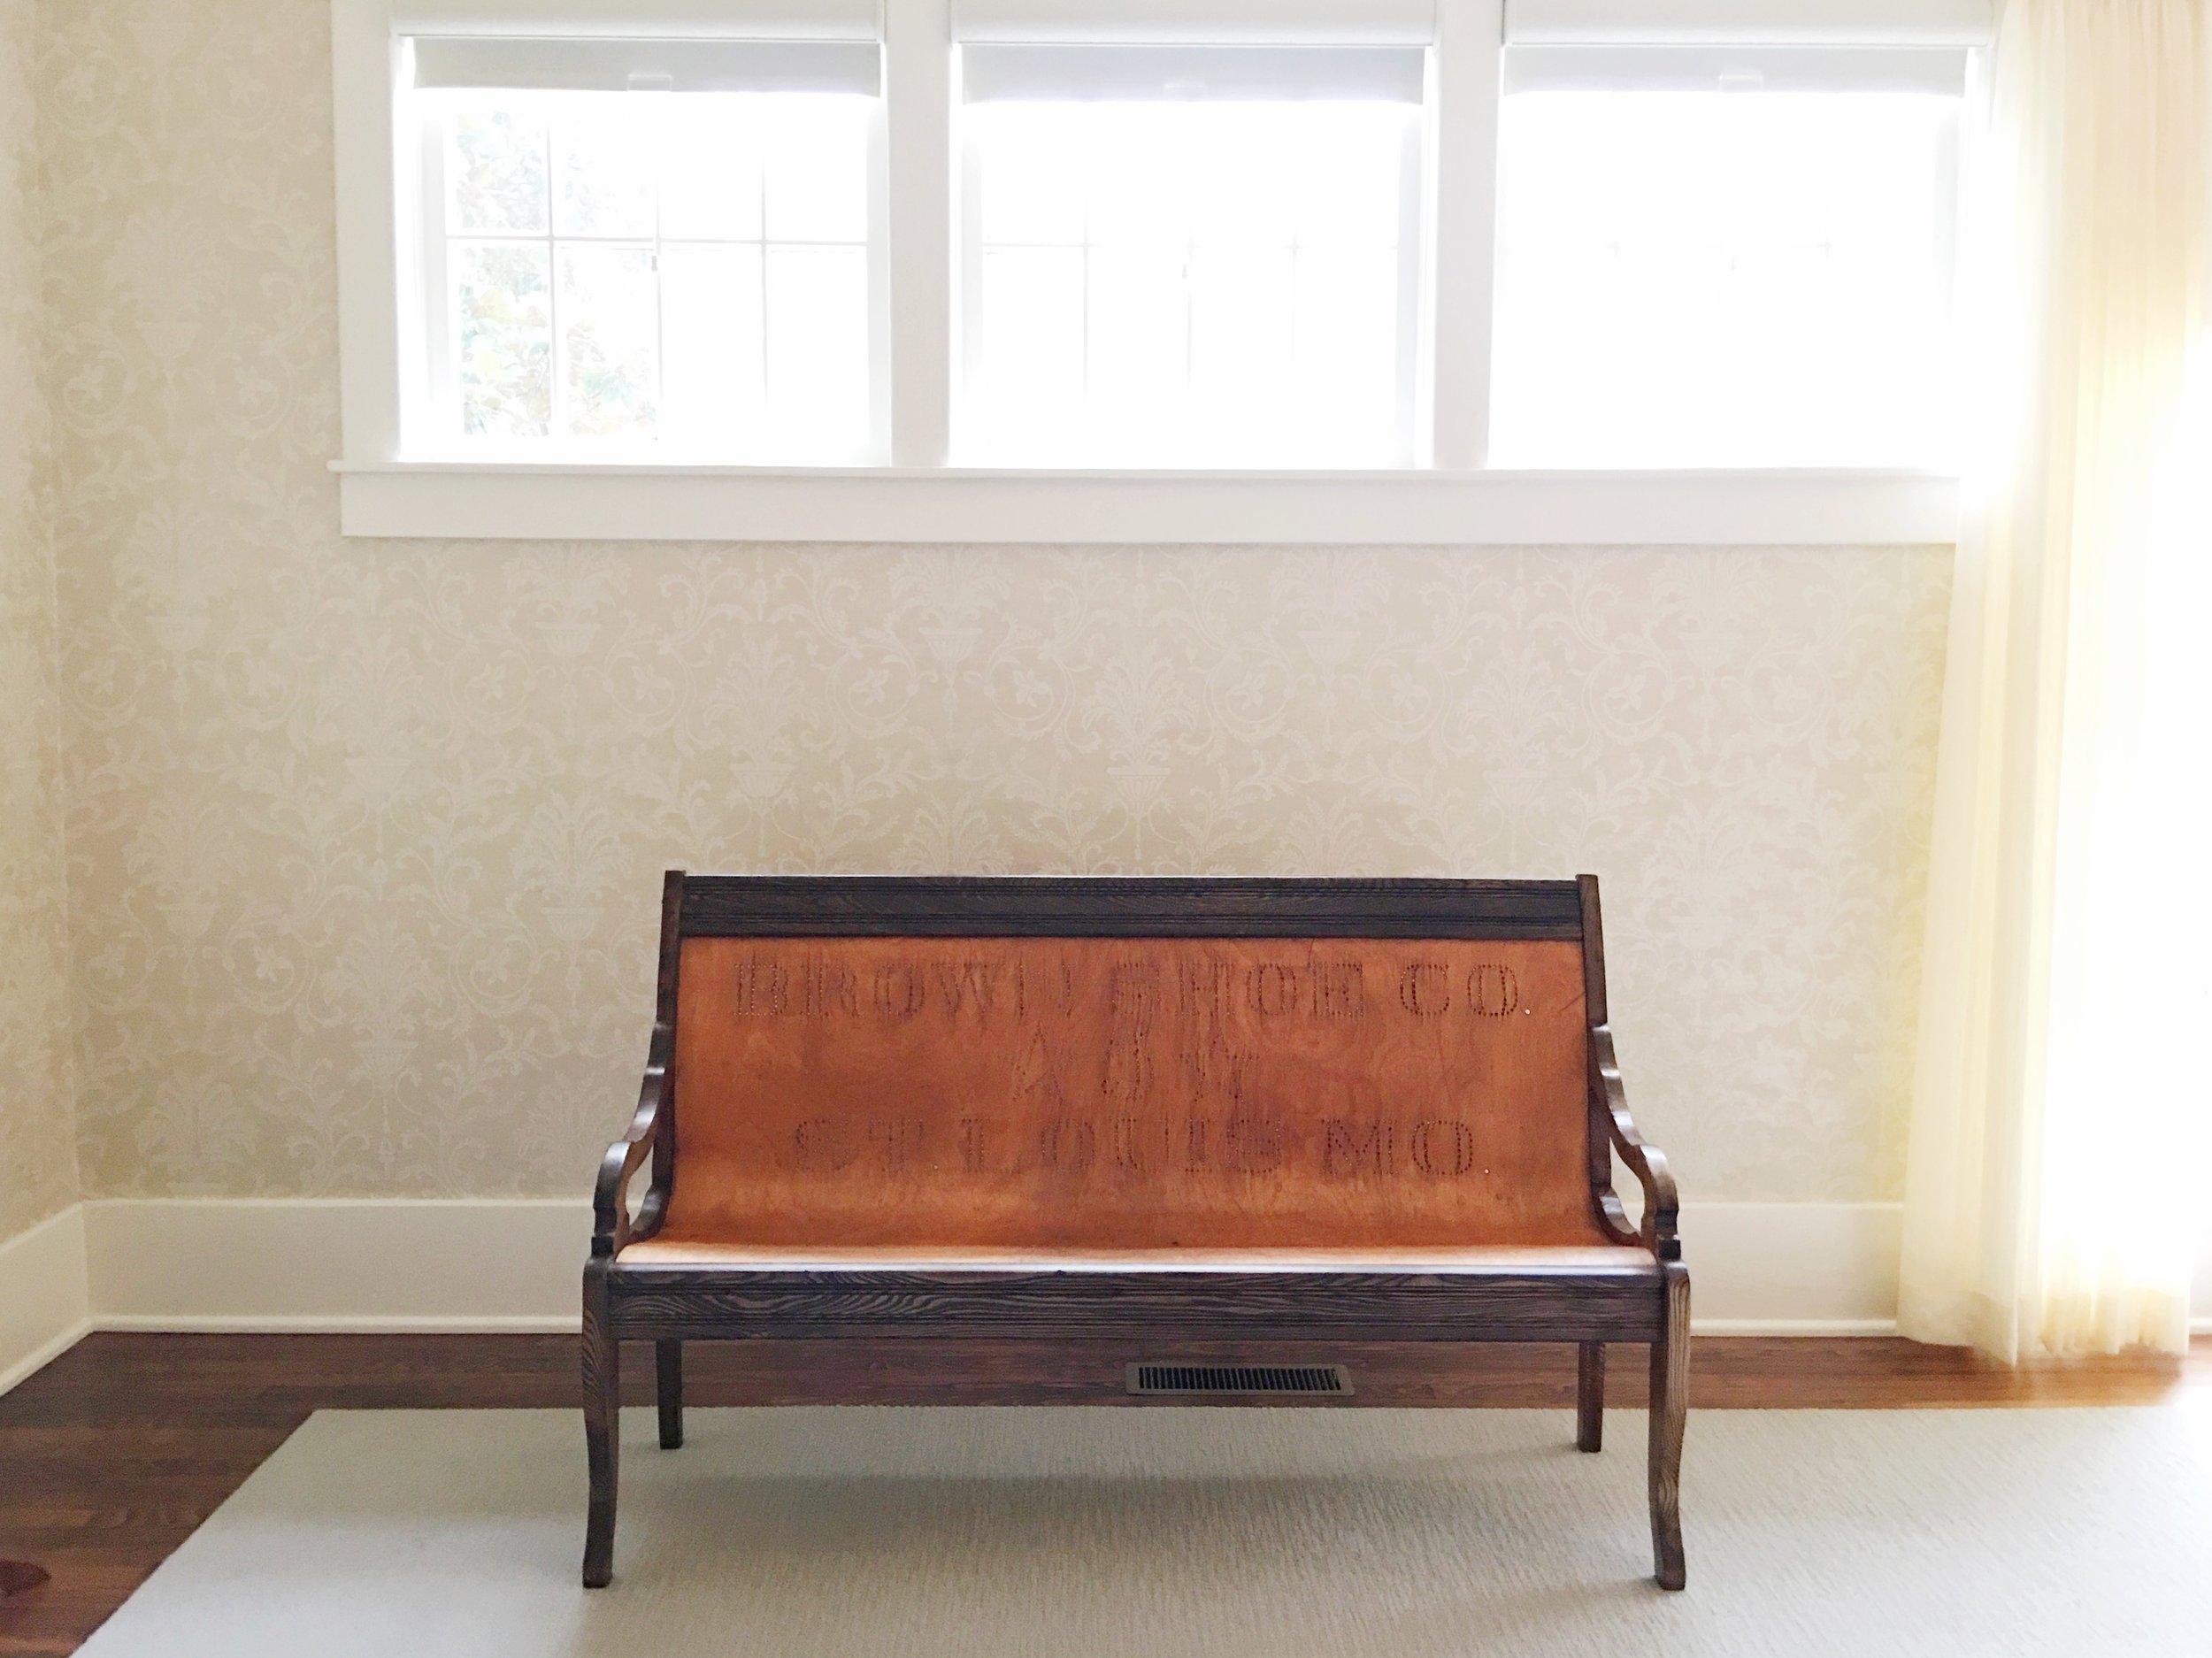 antique-bench-sharpe-house